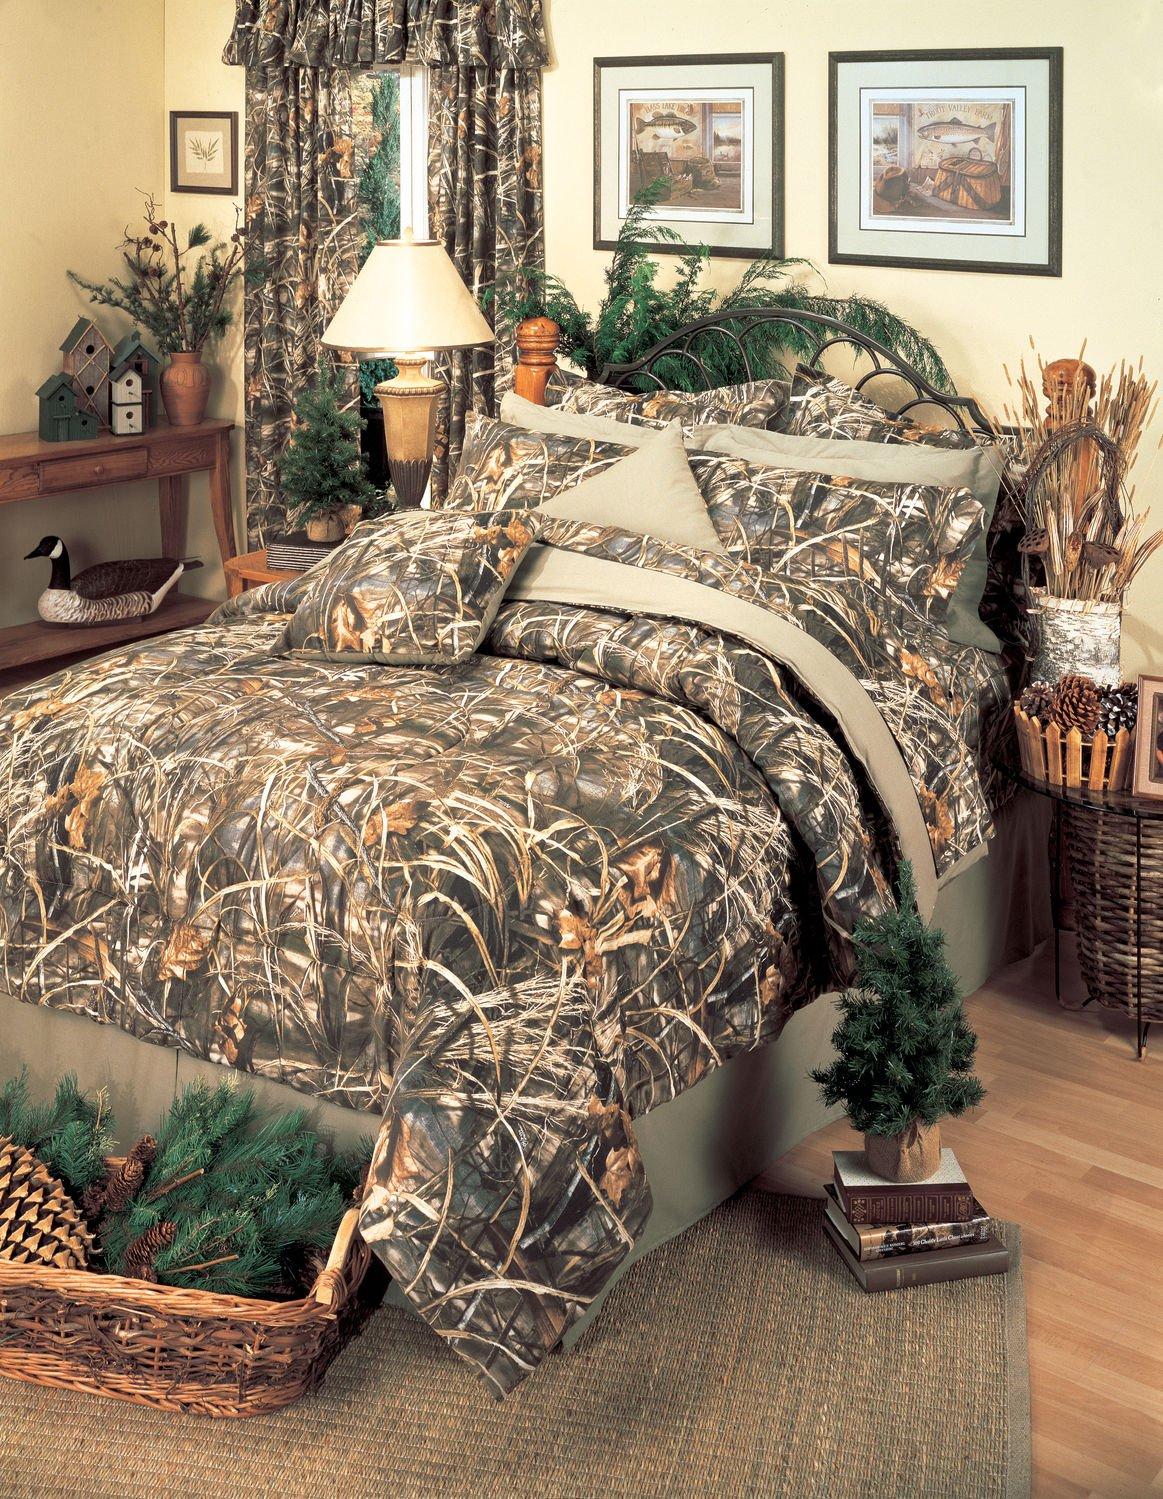 Realtree MAX-4 Camouflage 8 Pc Full Comforter Set (Comforter, 1 Flat Sheet, 1 Fitted Sheet, 2 Pillow Cases, 2 Shams, 1 Bedskirt) SAVE BIG ON BUNDLING!